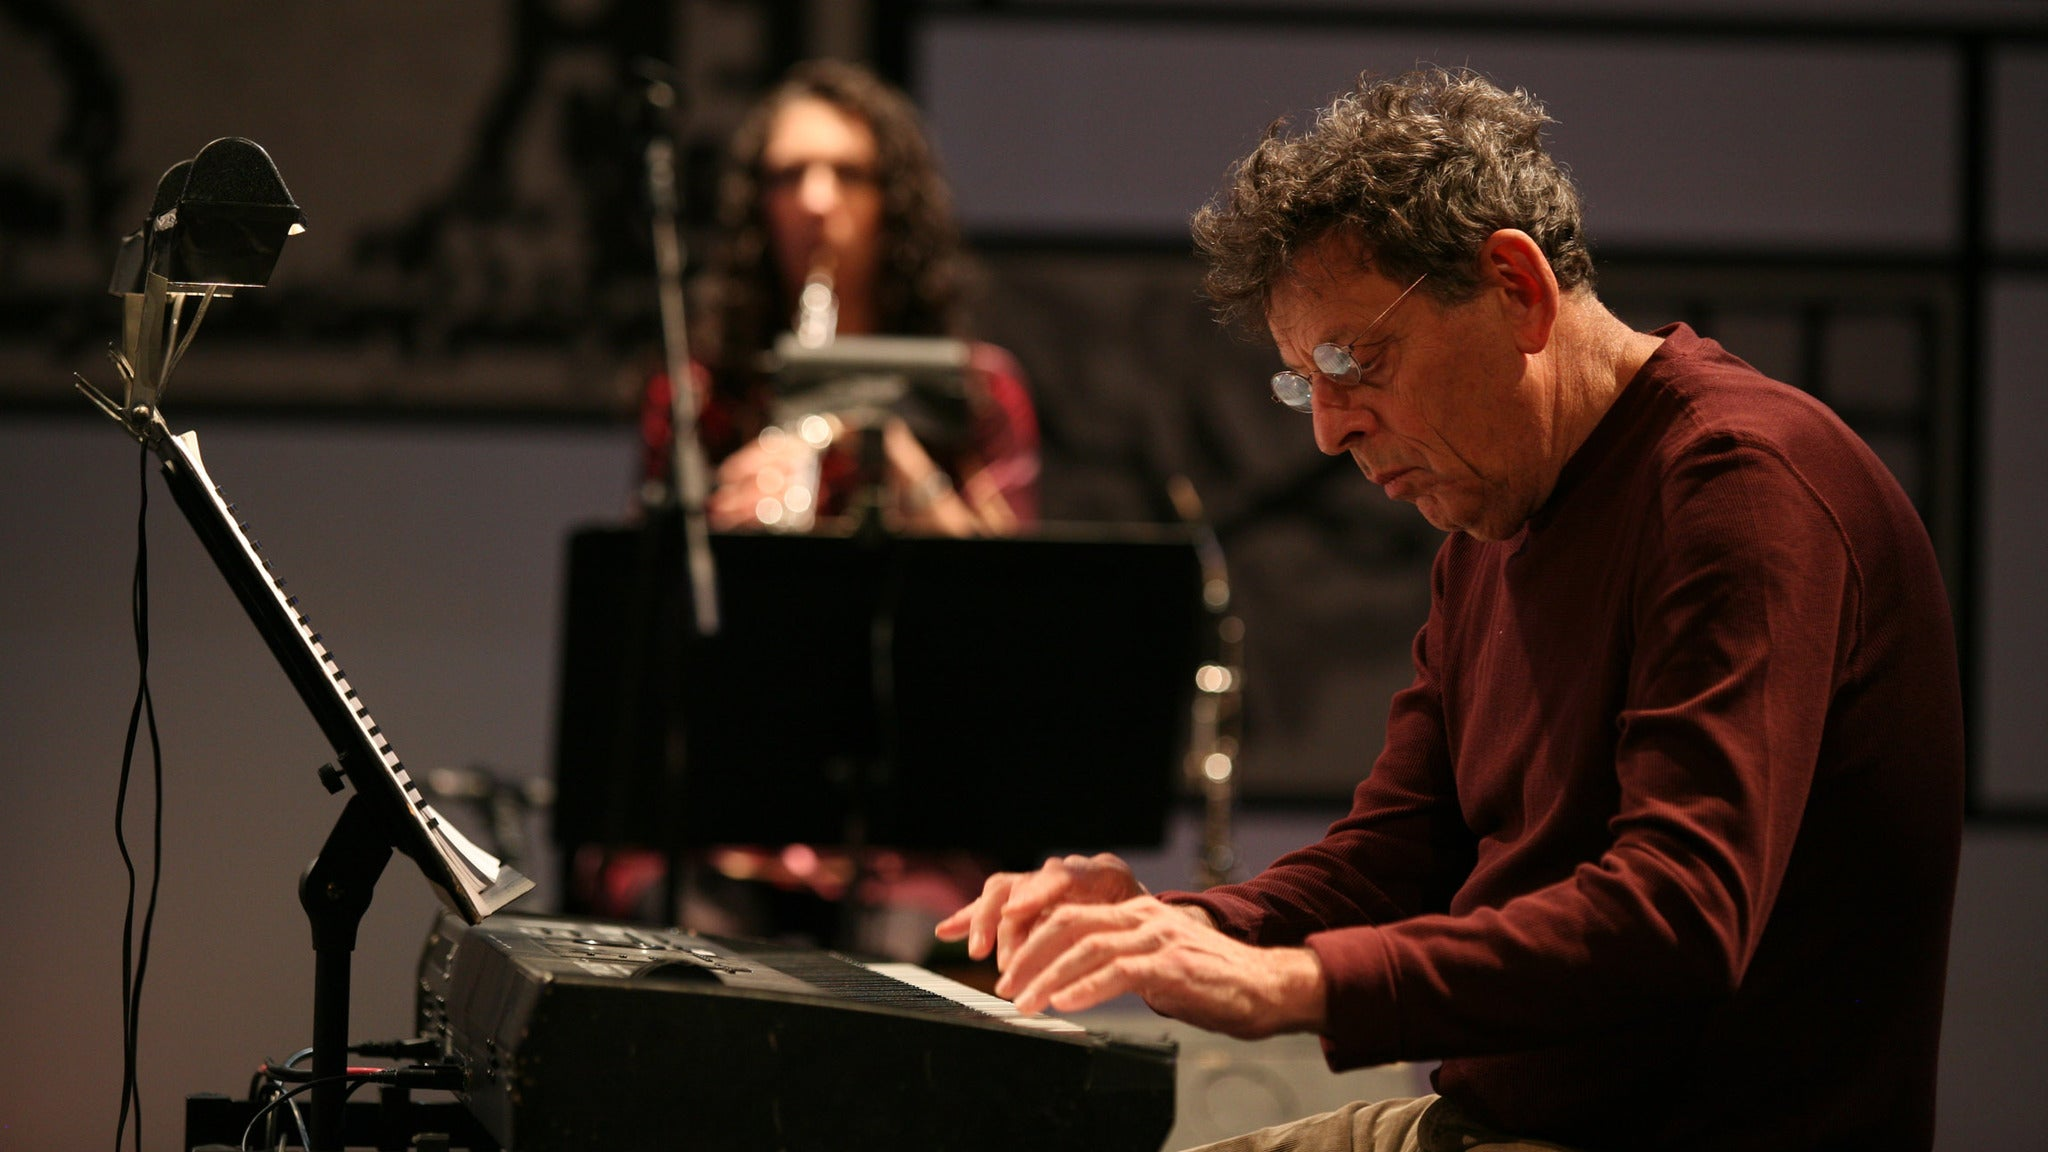 KOYAANISQATSI LIVE! Performed by Philip Glass & Ensemble